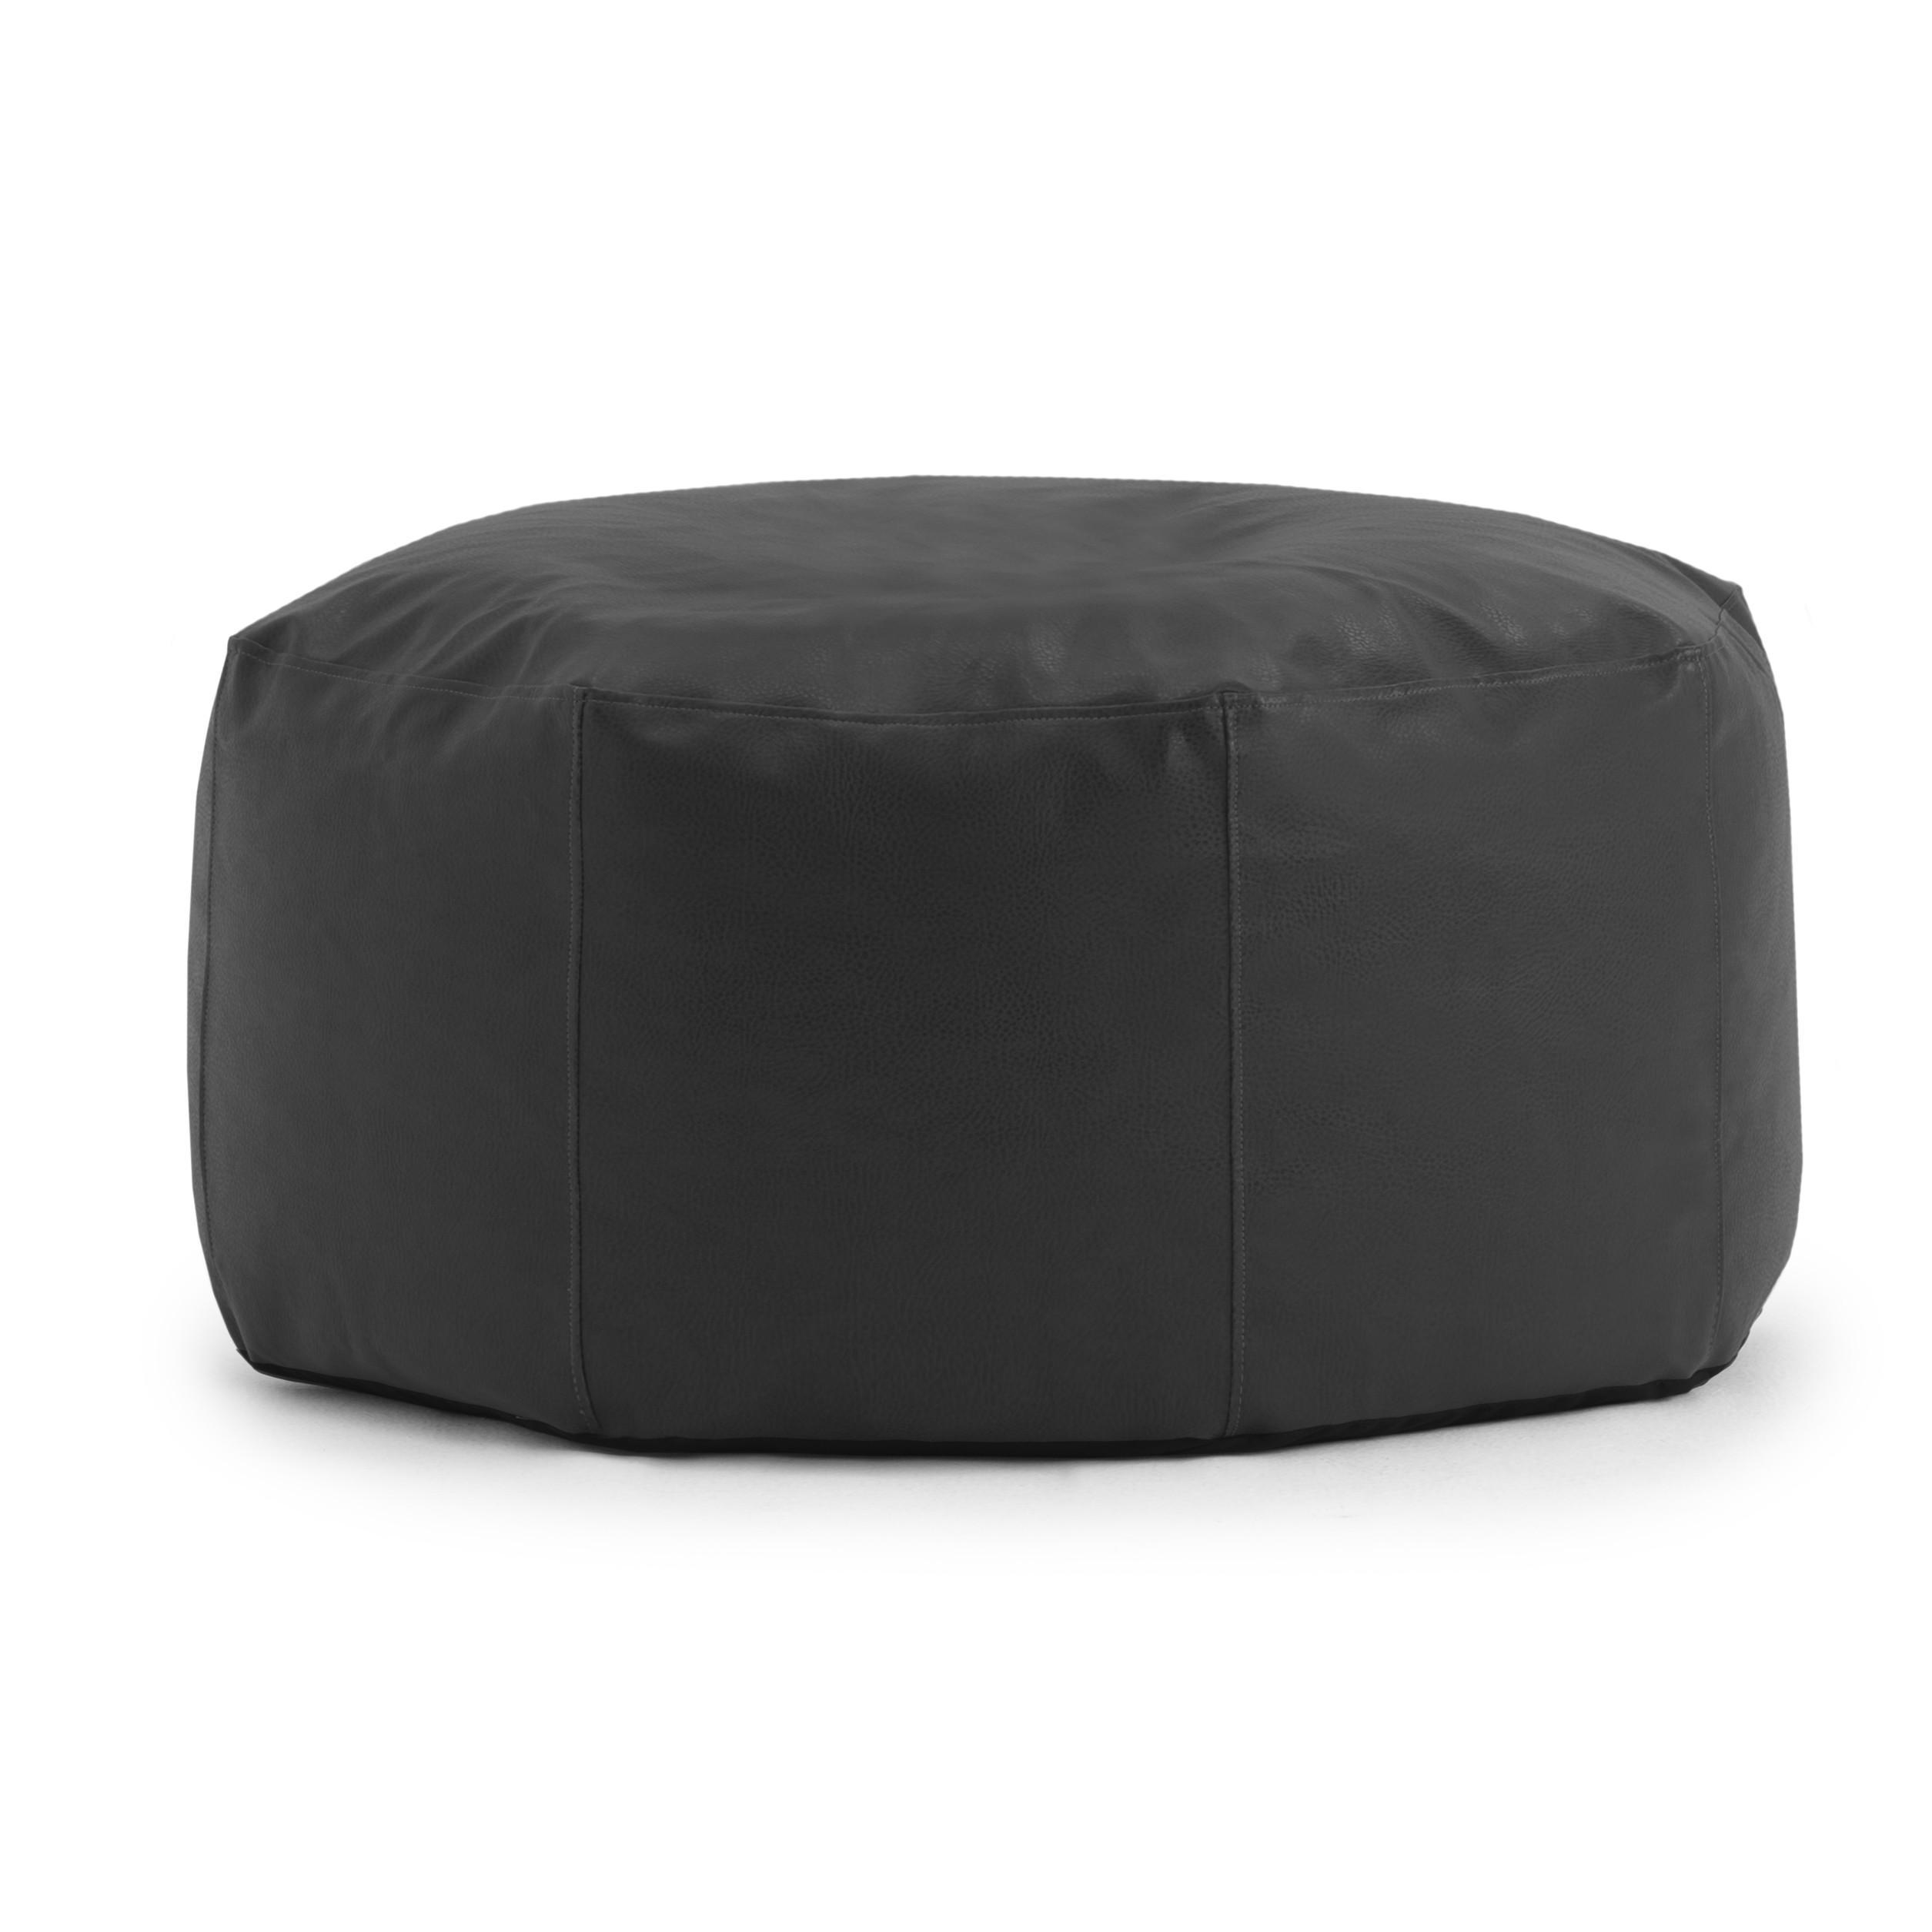 Big Joe Modular Sofa | Sofa Gallery | Kengire with Big Joe Modular Sofas